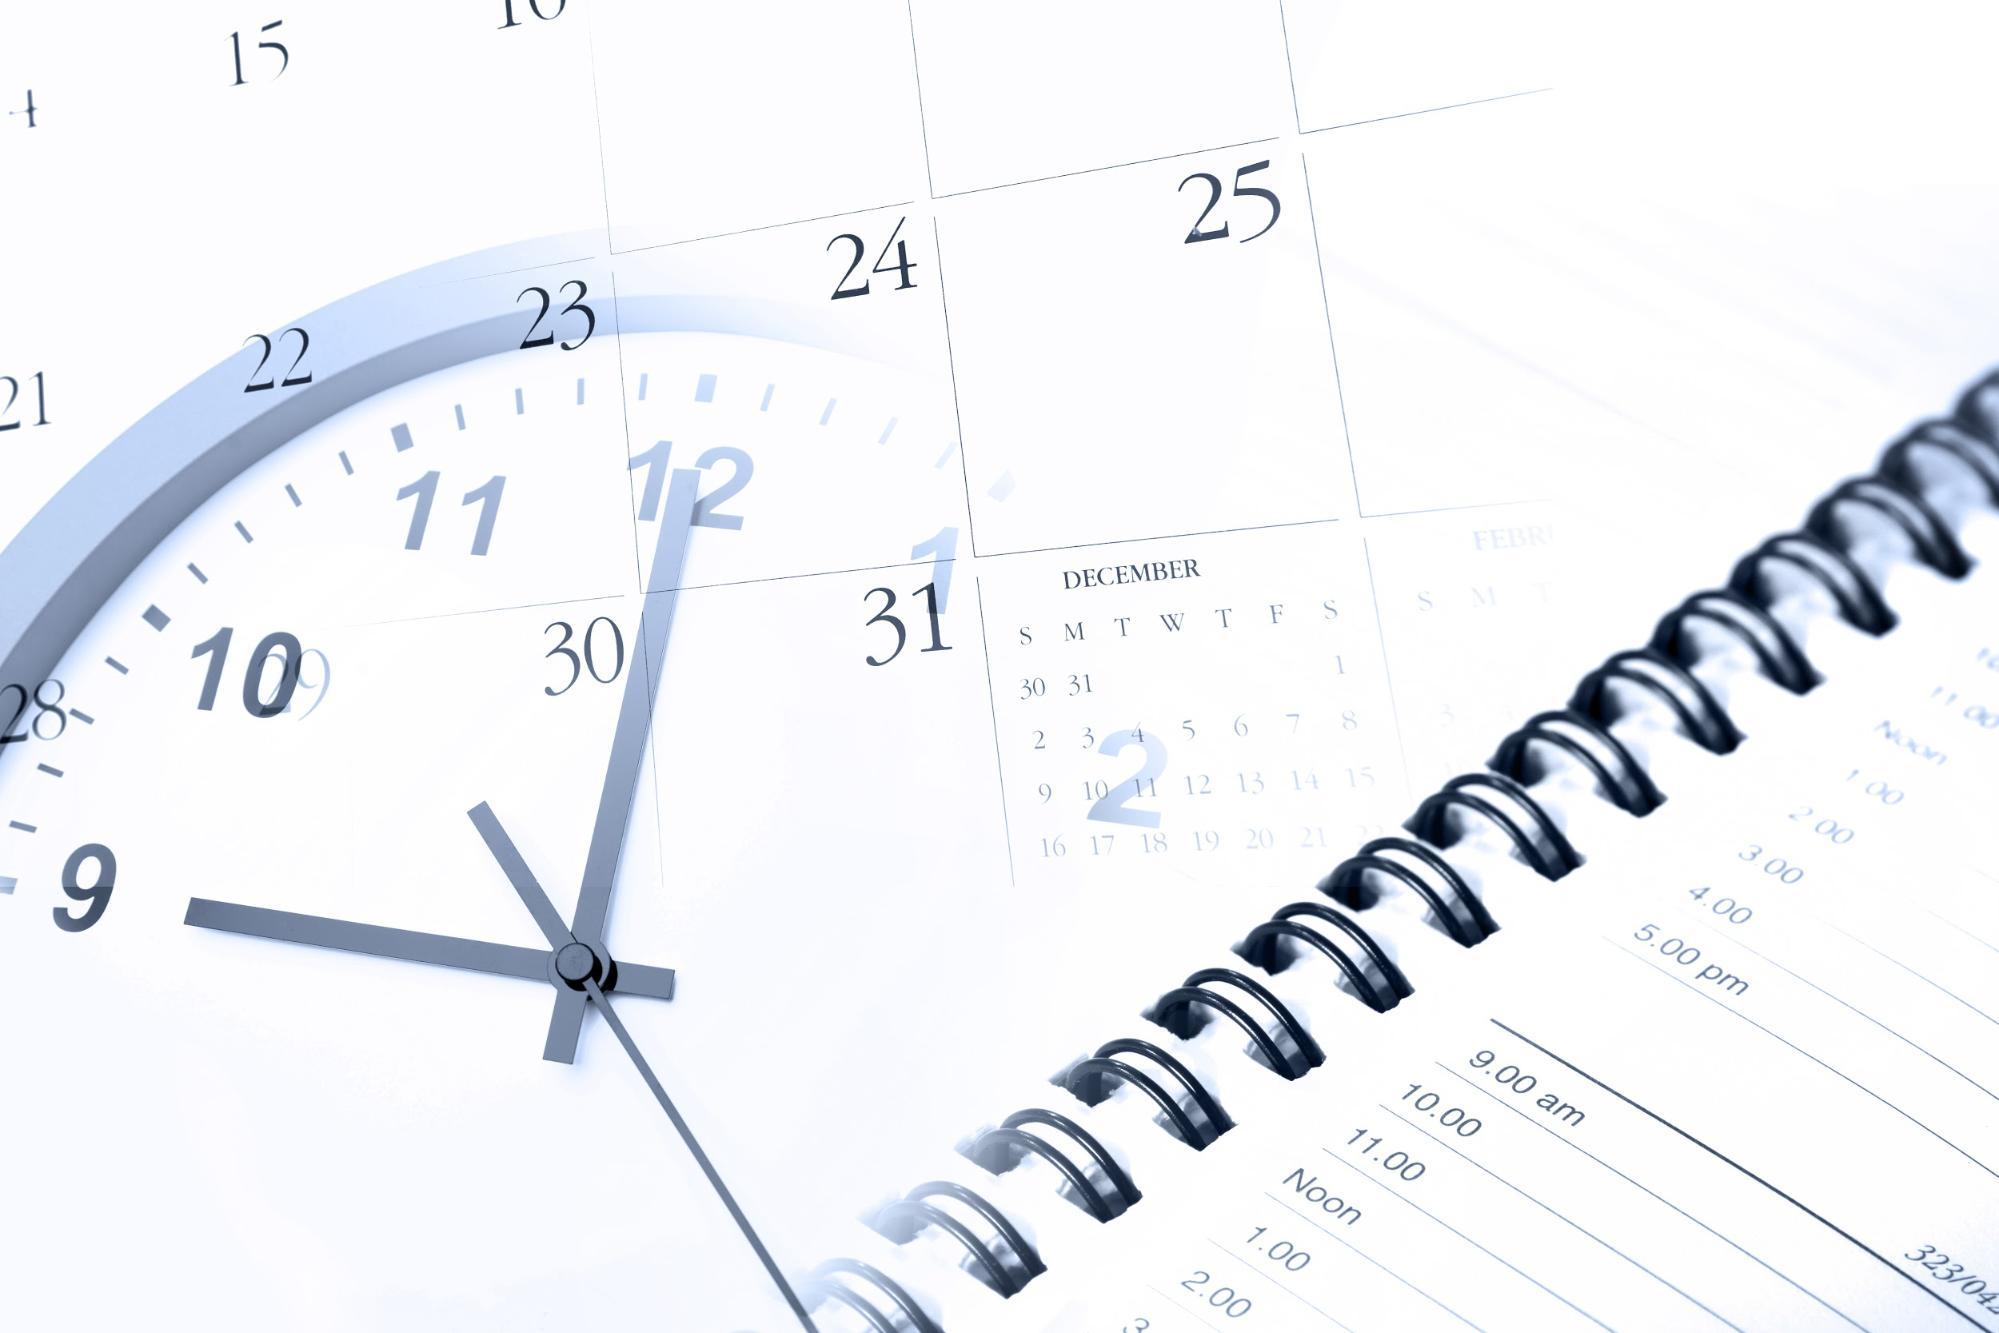 horaires de trading octobre 2018